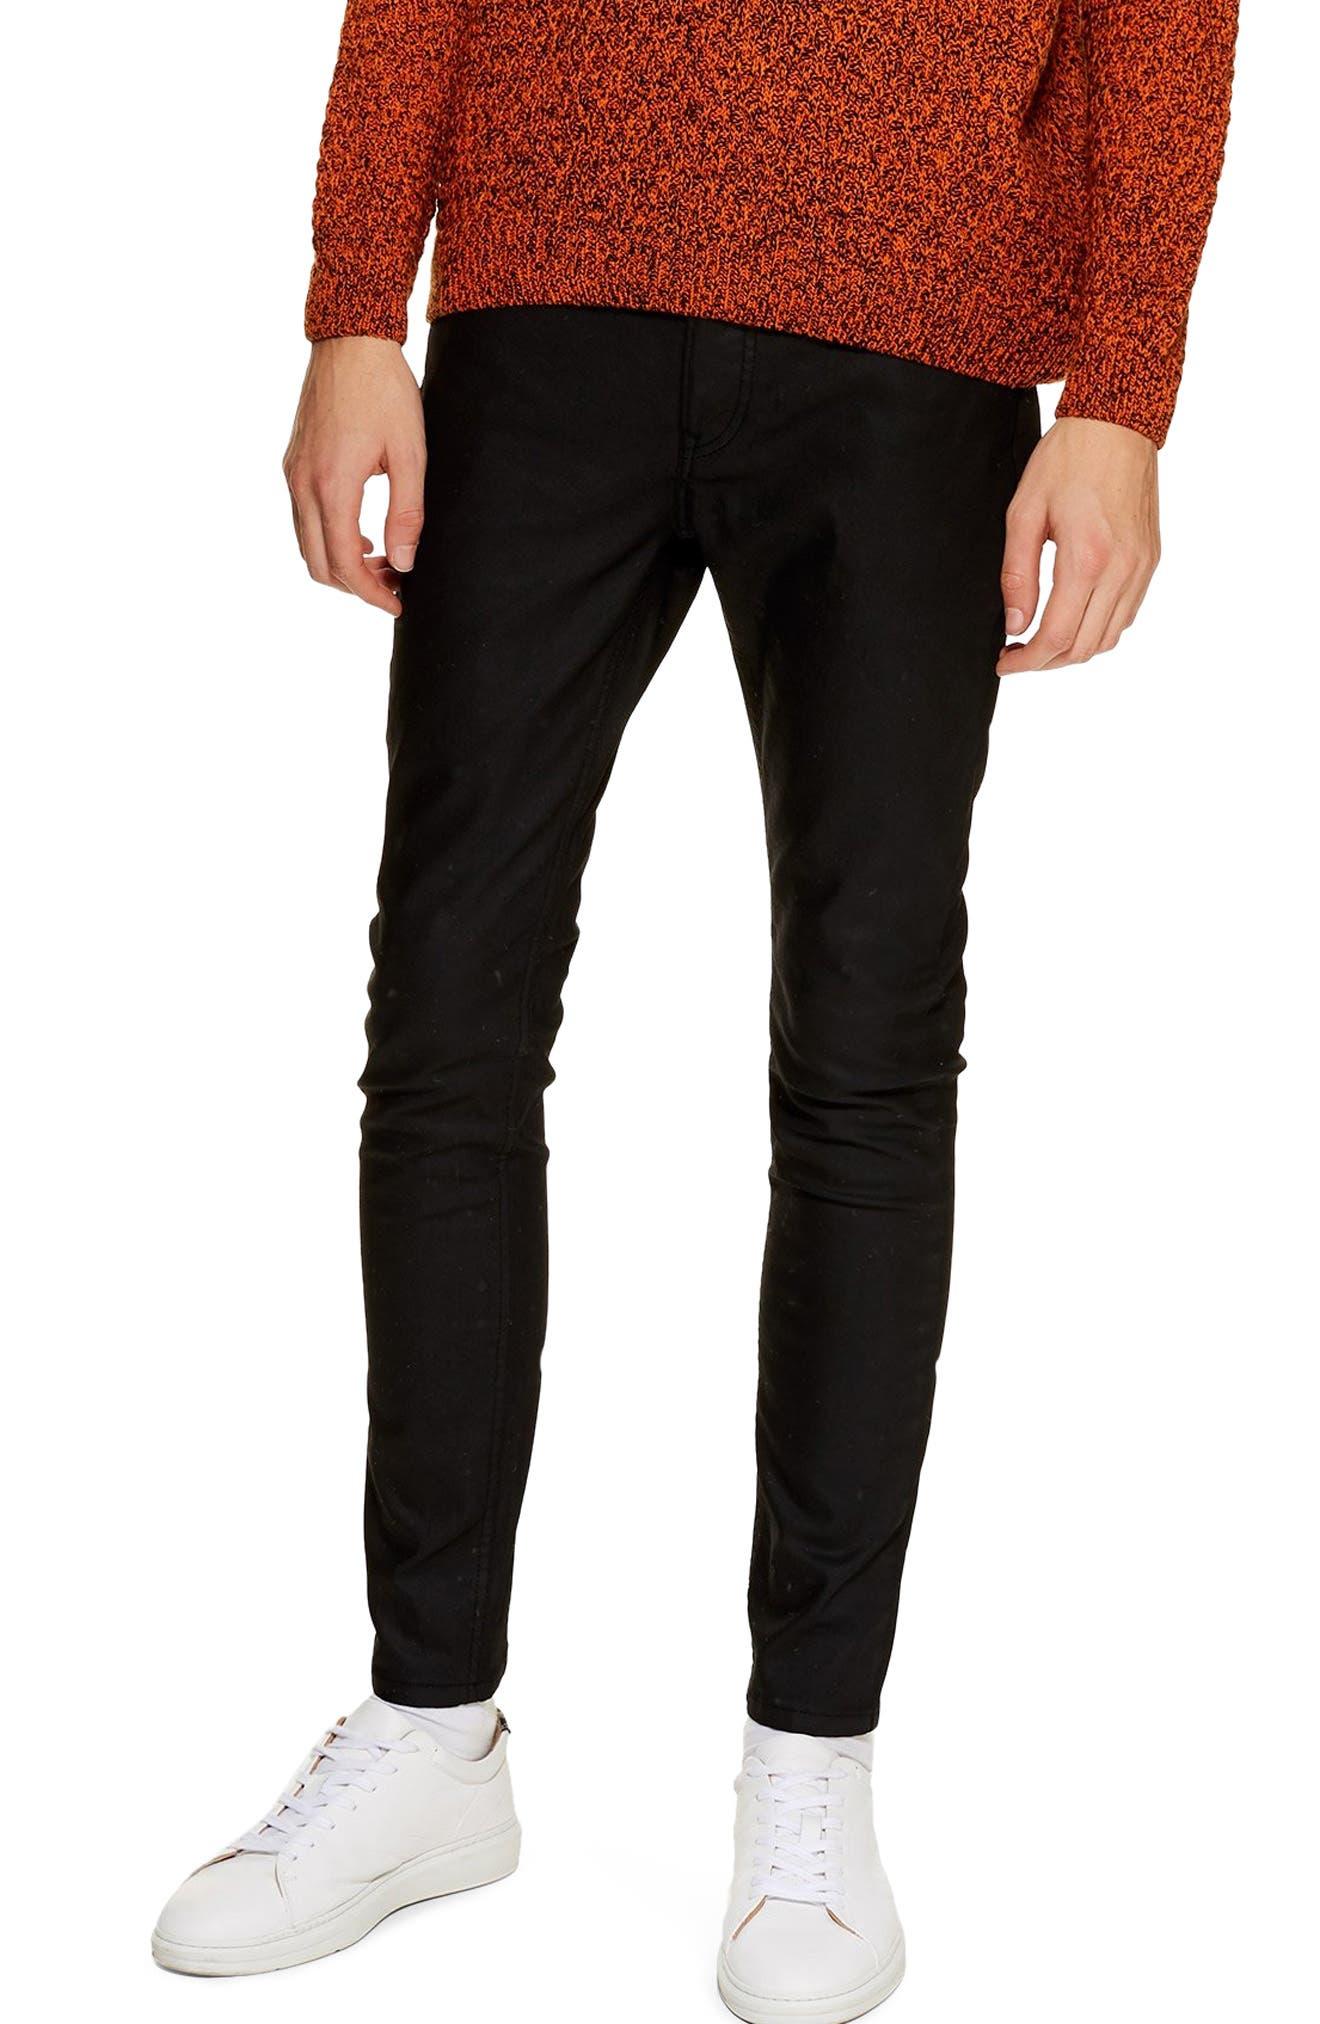 Coated Denim Skinny Jeans, Main, color, 001